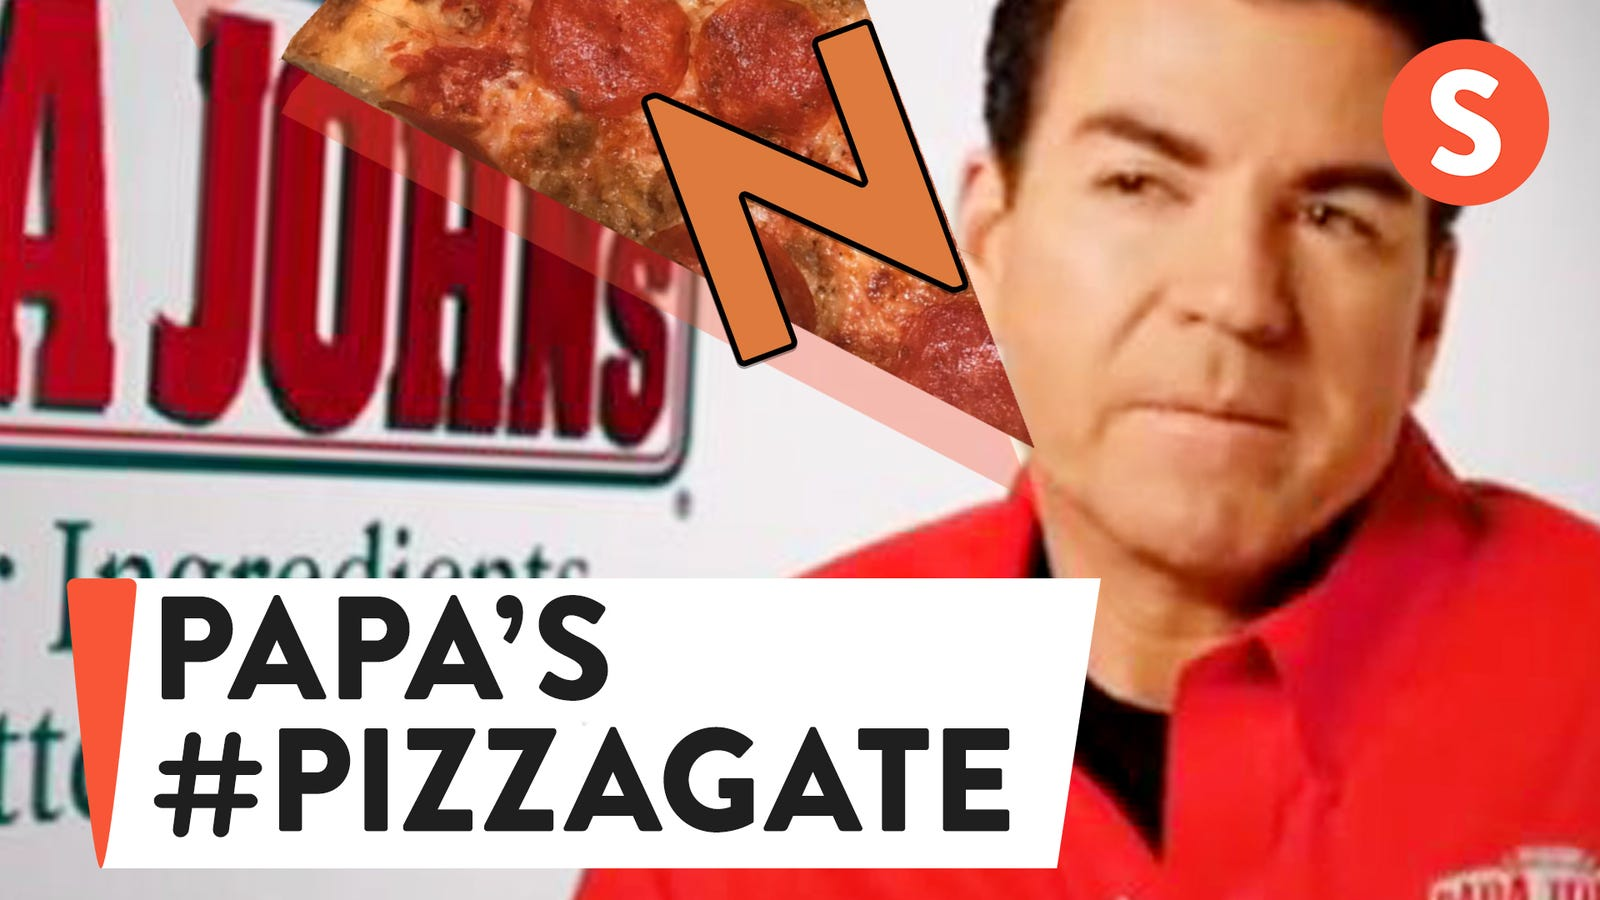 Resultado de imagen de papa john  pizzagate